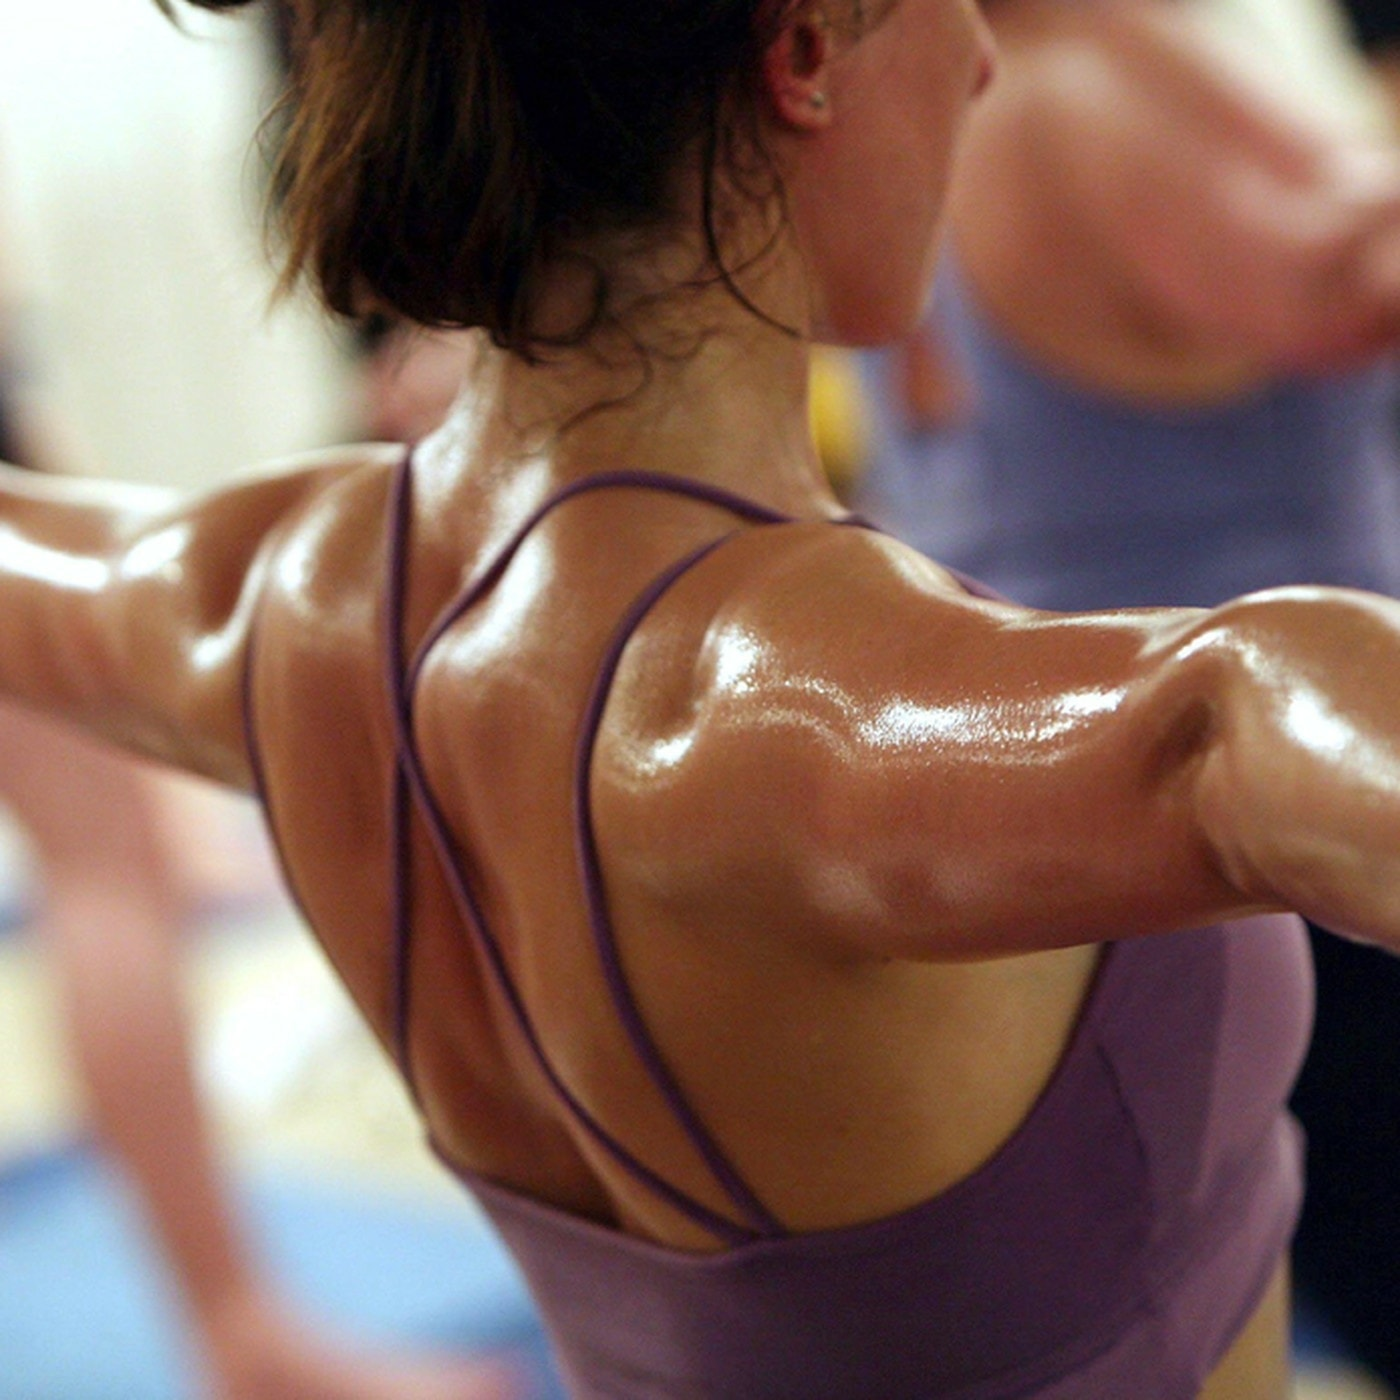 Just tomorrow Hot Yoga class is £8.50! W